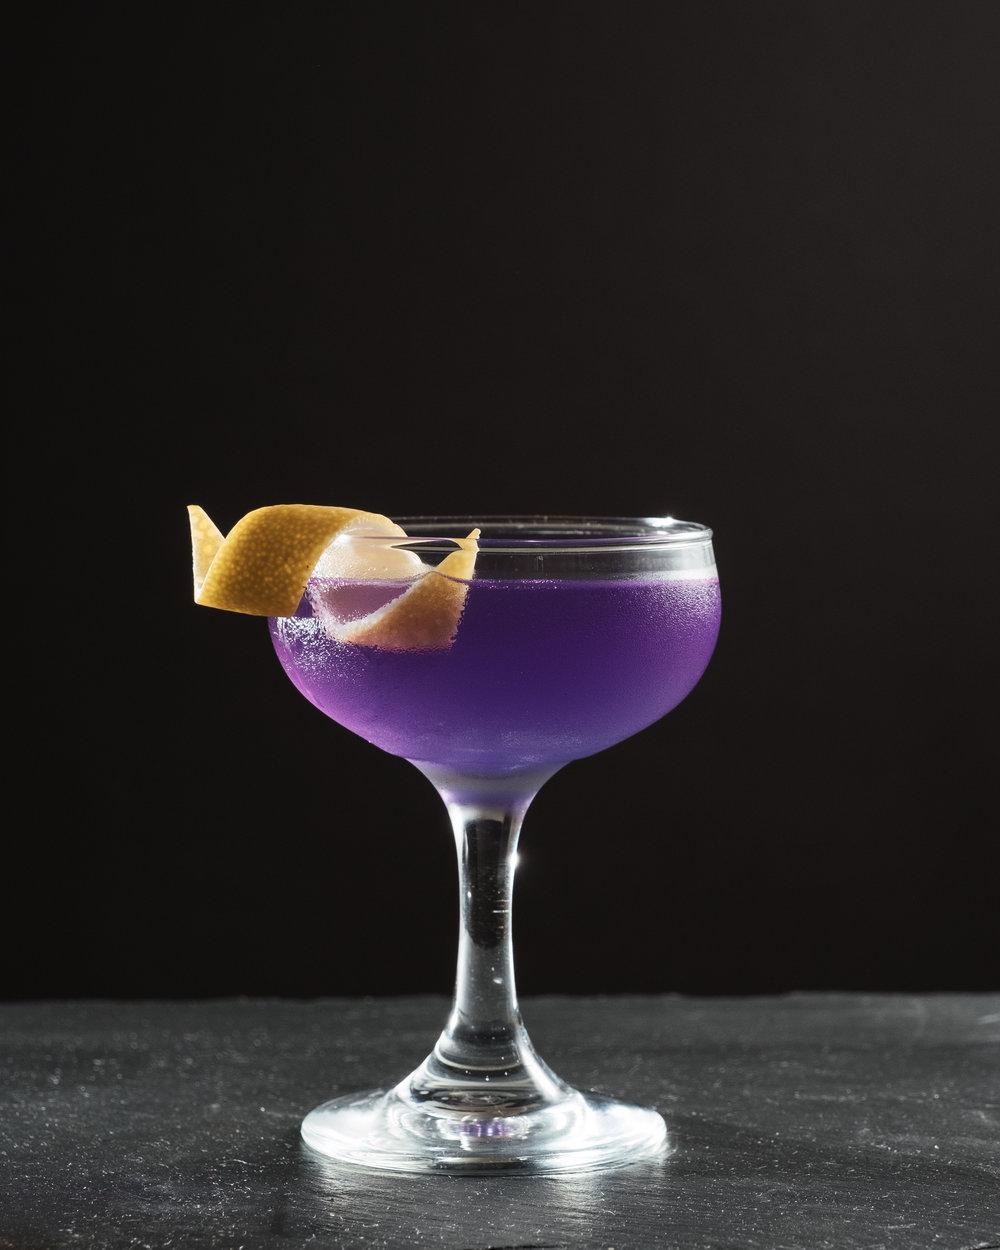 ingredients: - 2 oz Empress Gin¾ oz Cocchi Americano (blanc vermouth)¼ oz Green Chartreuse2 dashes grapefruit bittersAbsinthe rinse